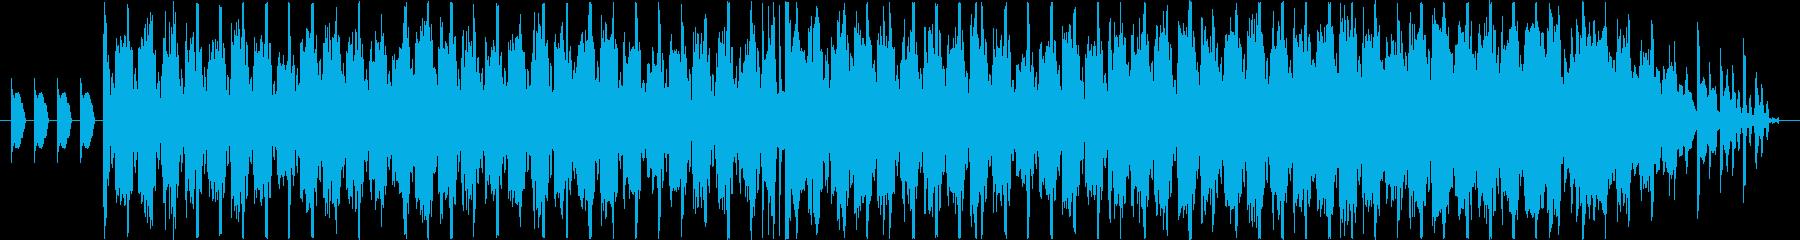 nightclub Mirageの再生済みの波形